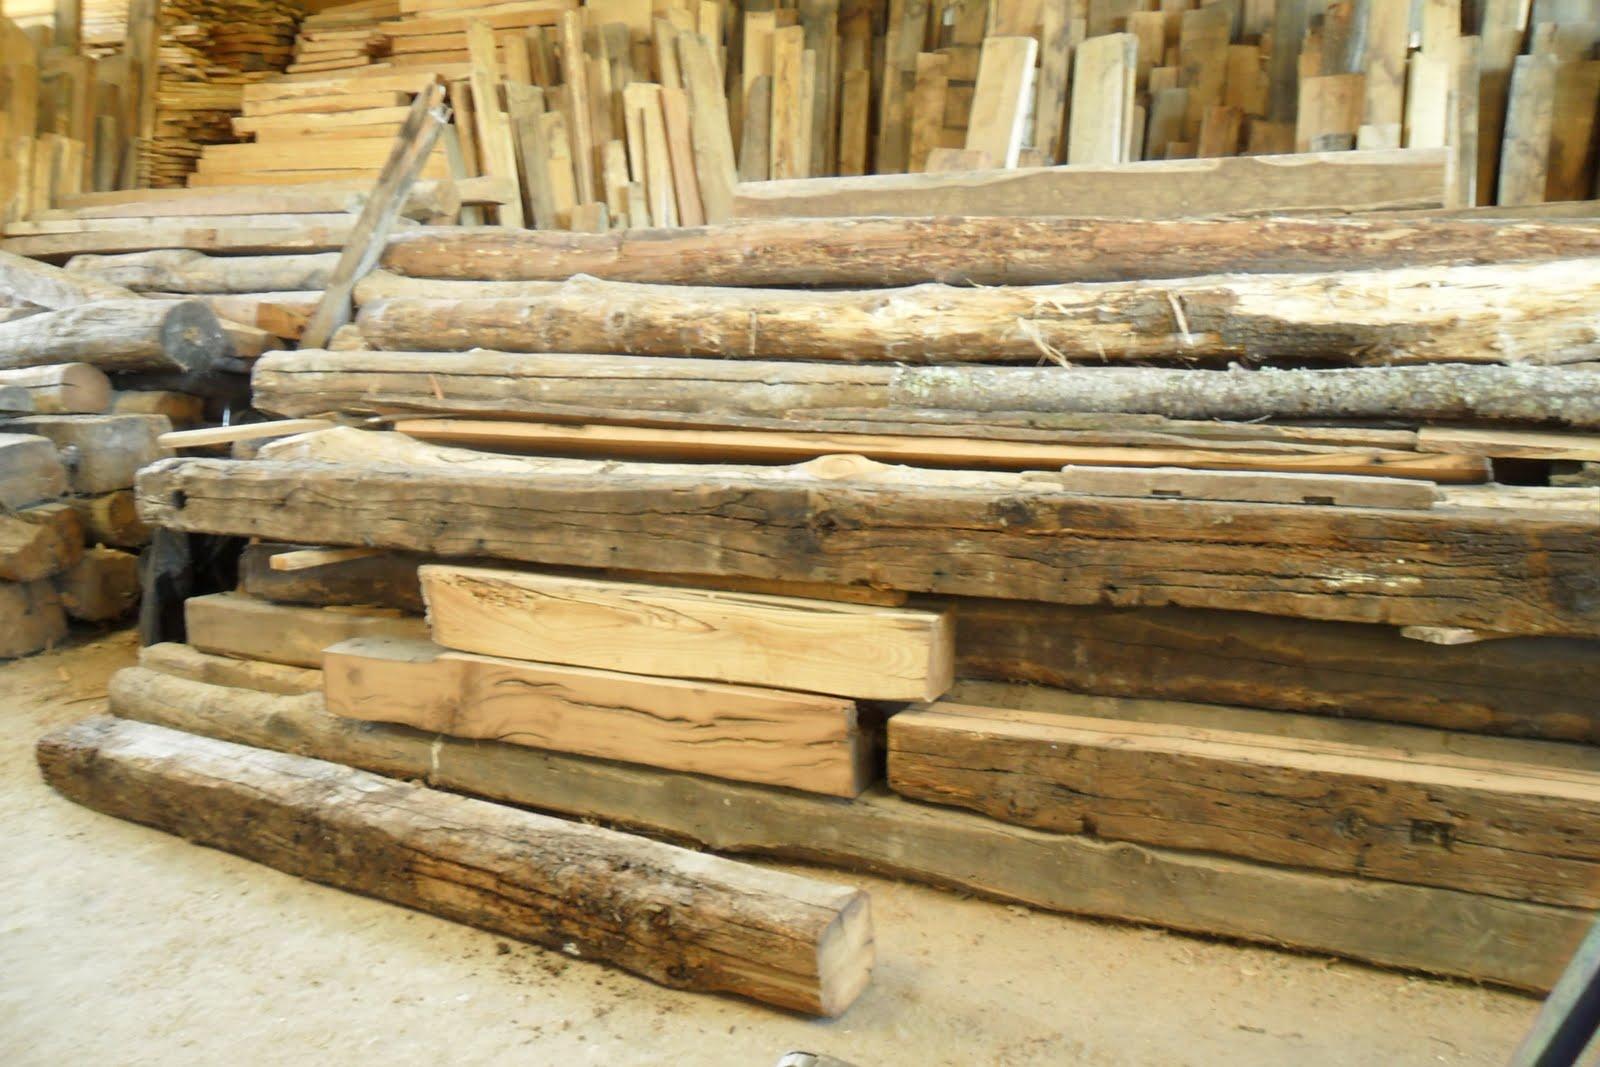 Carpinteria de madera corriols artesanos de hervas vigas for Tejados vigas de madera